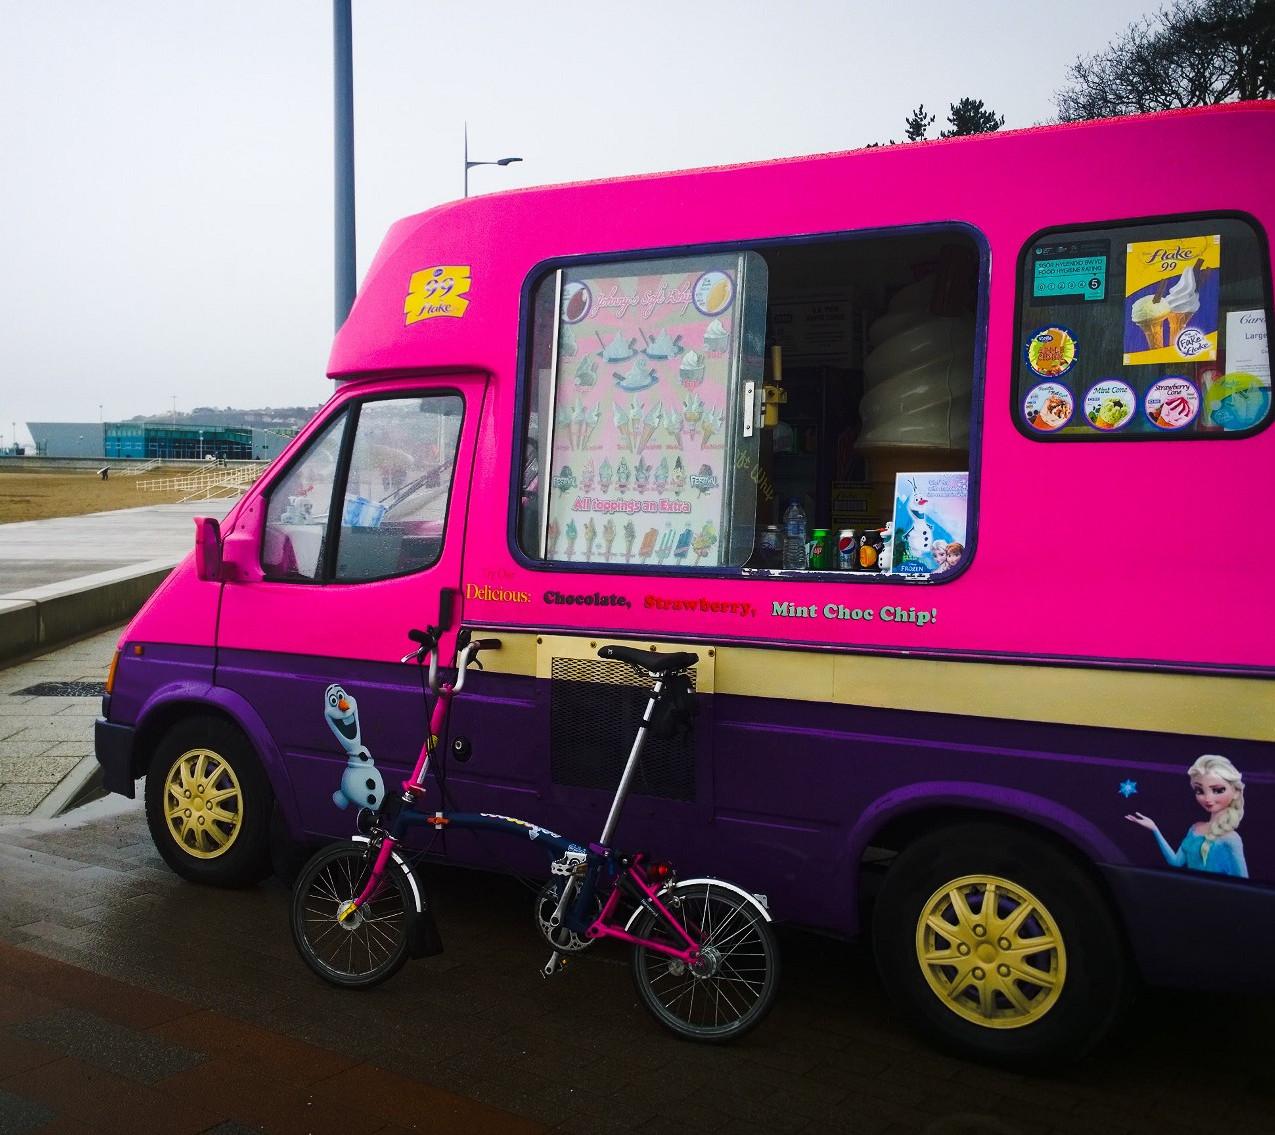 Pink and purple ice cream van